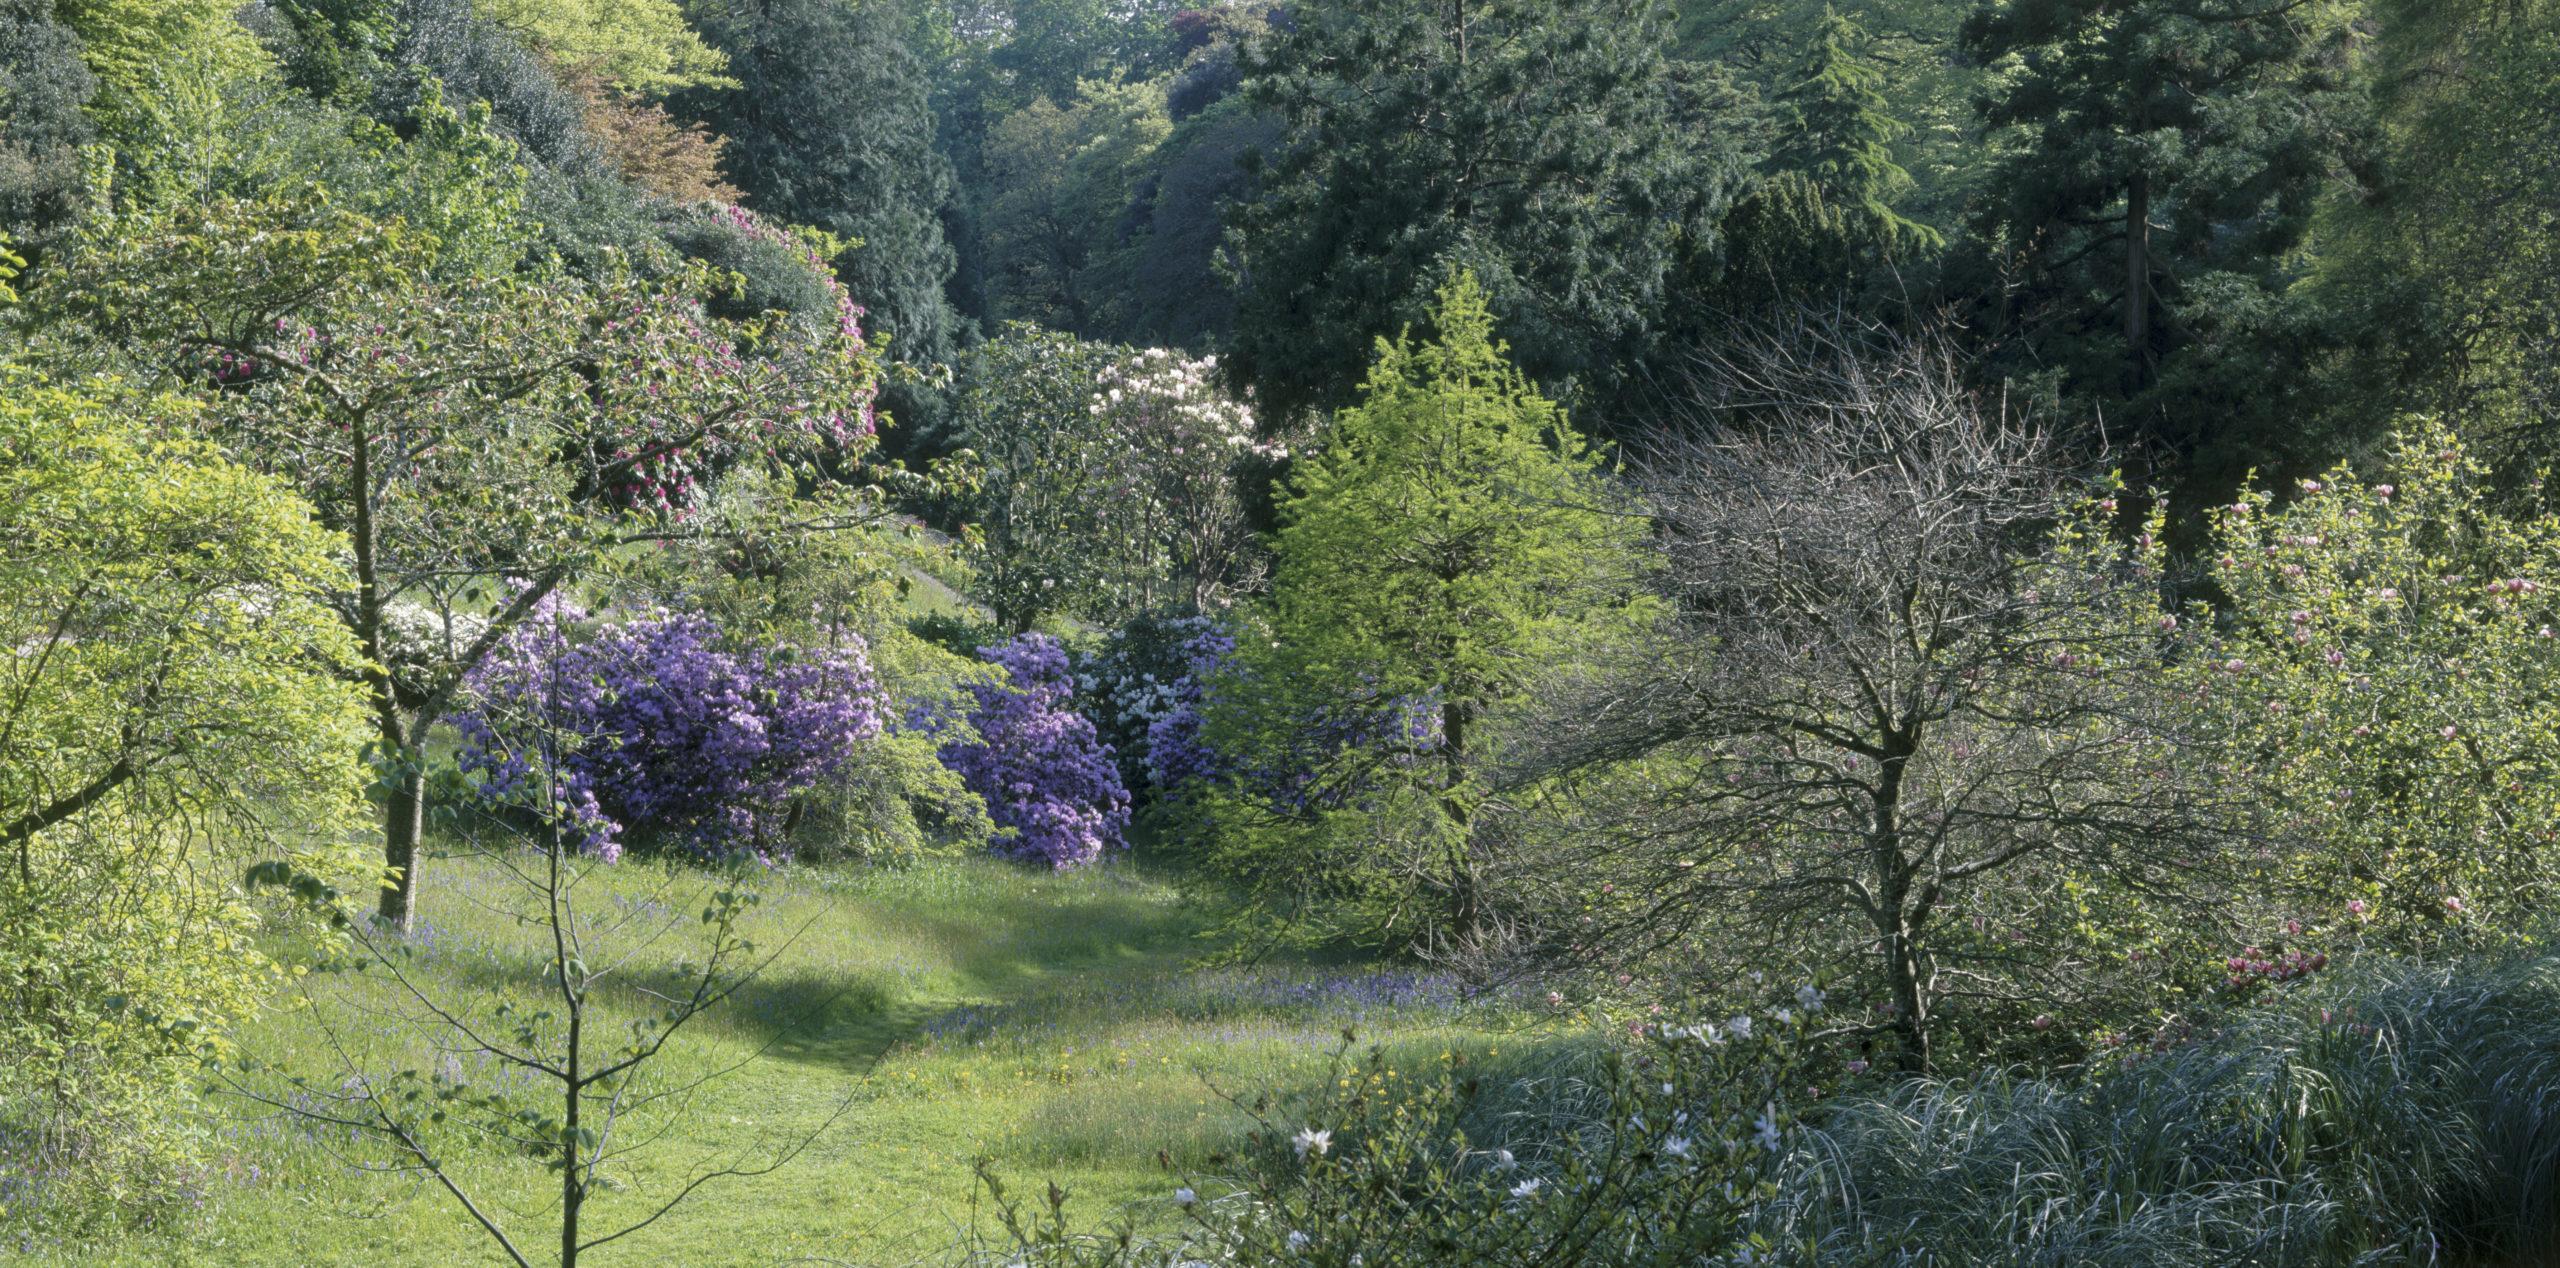 Early spring blossom at Glendurgan in Cornwall. © Hilary Daniel & NTI